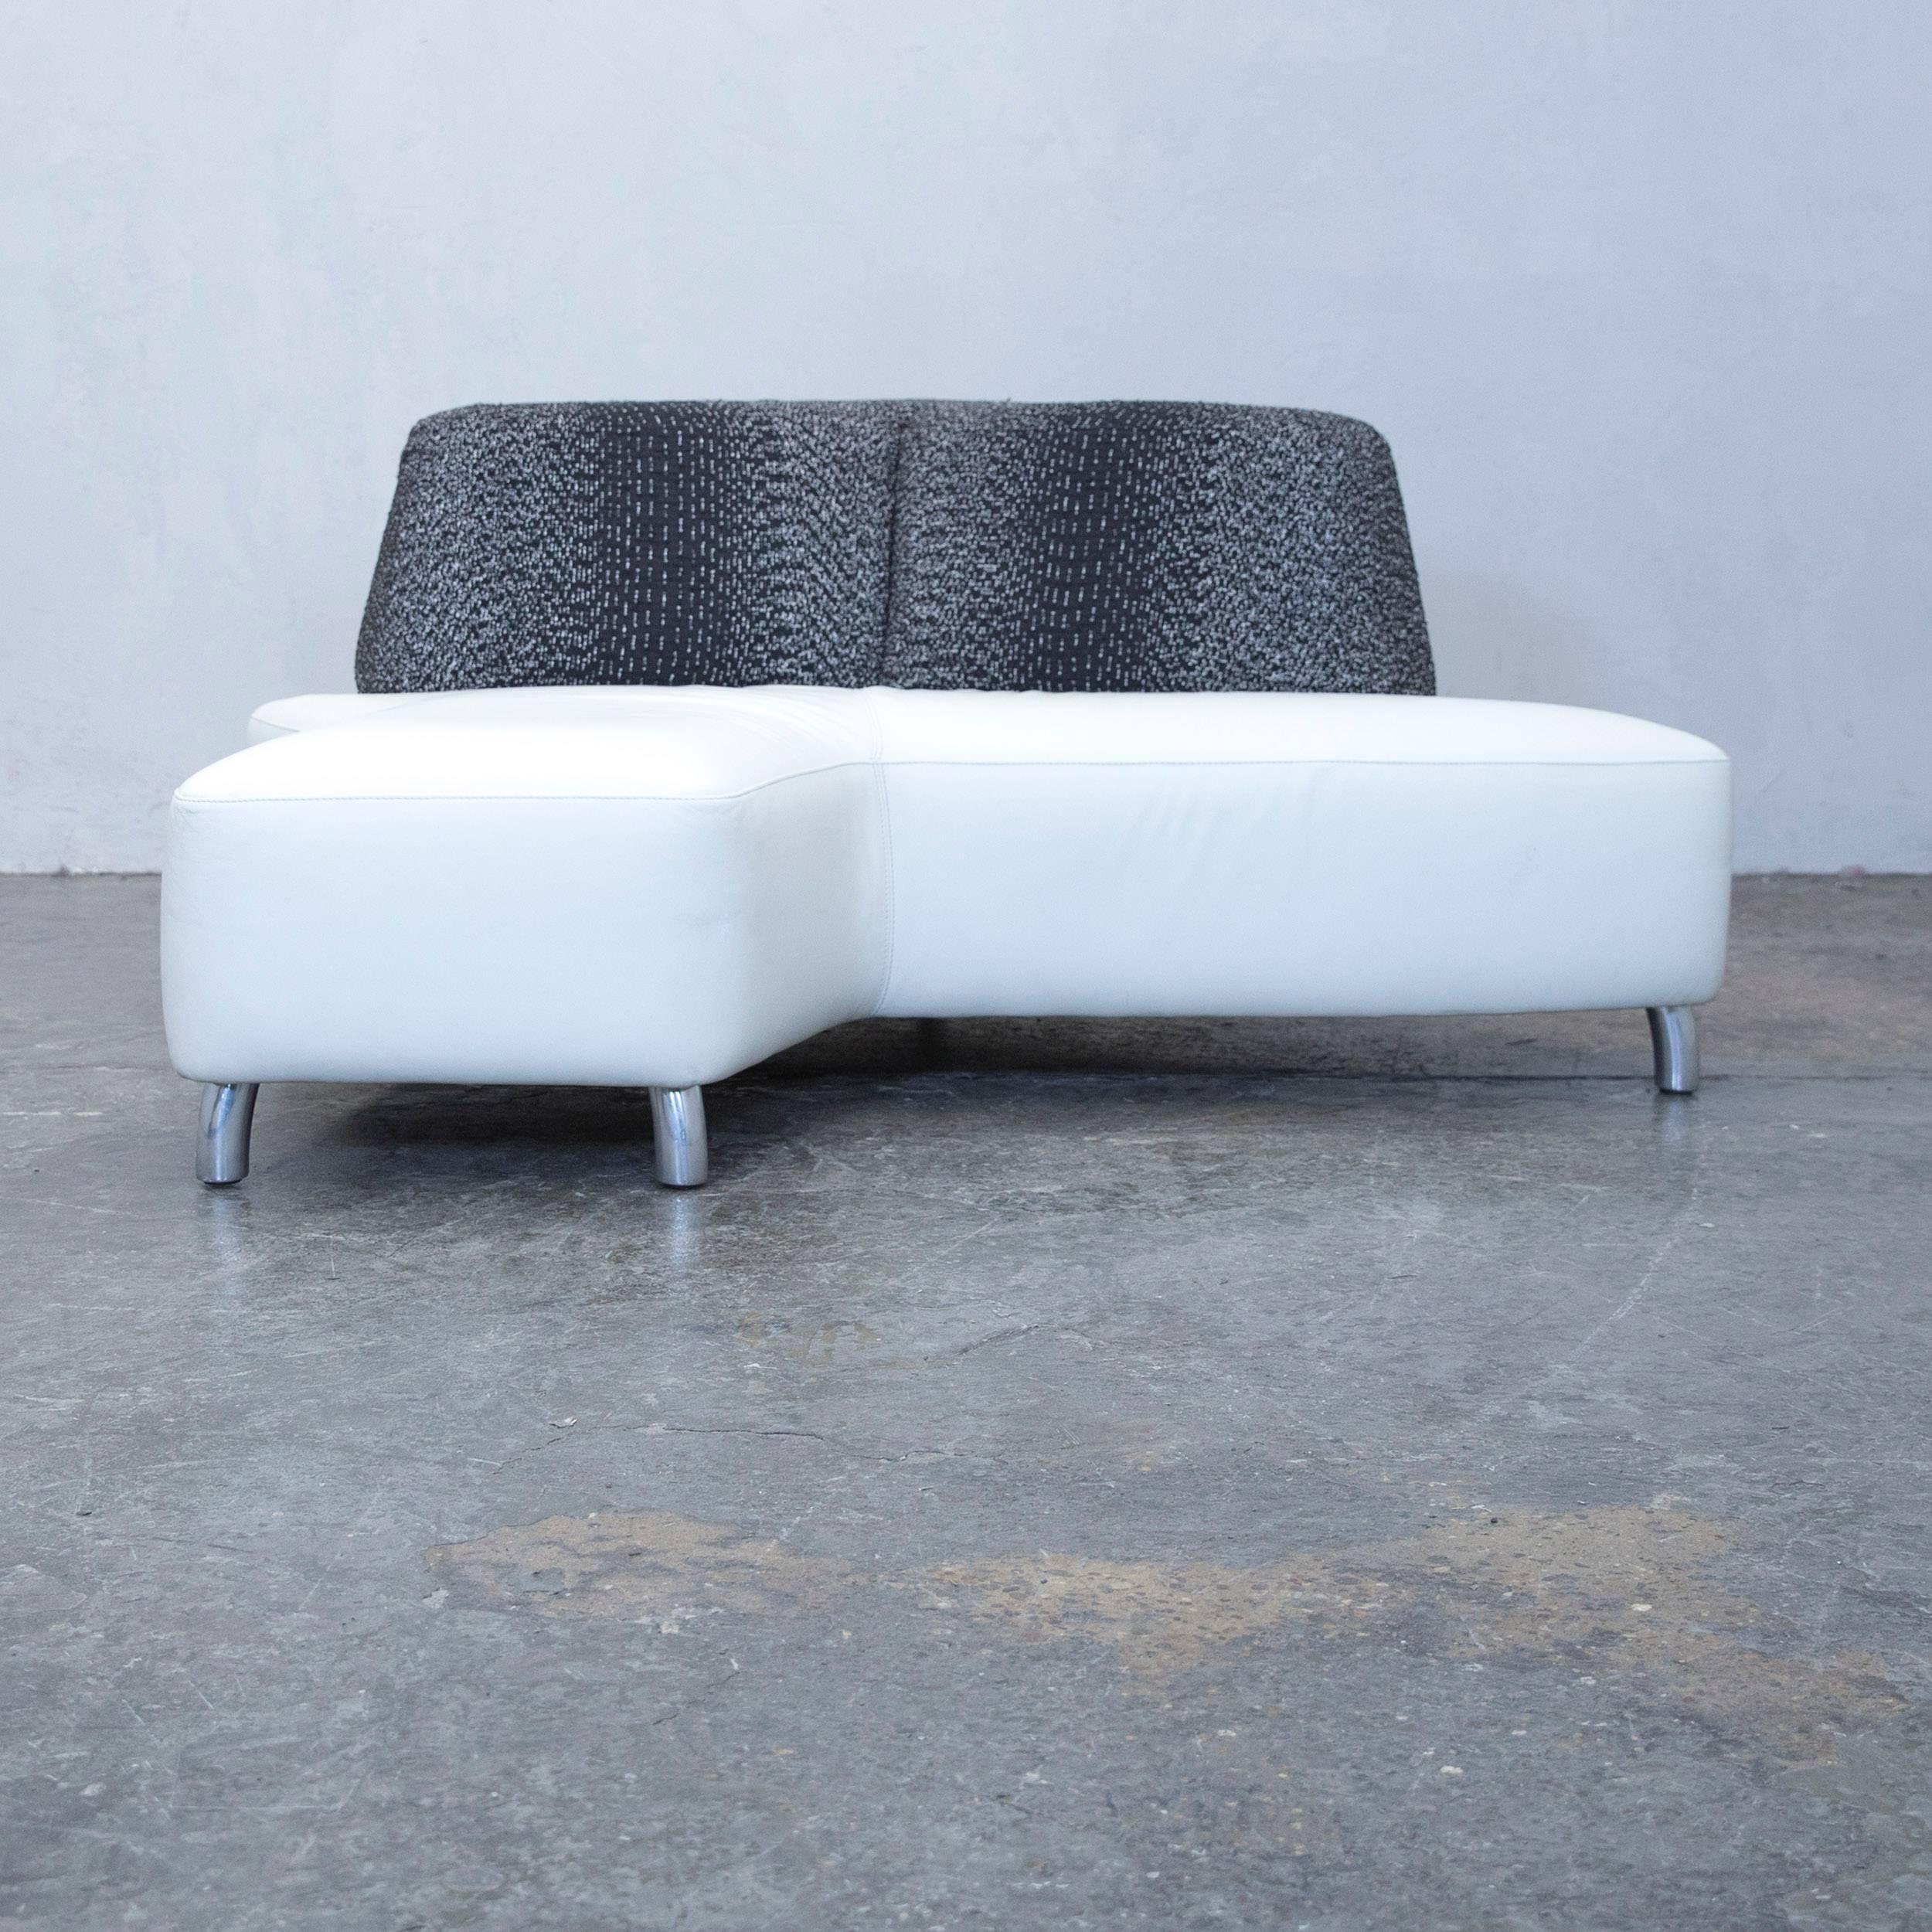 designer sofas gebraucht fabulous designer sofas gunstig big sofa weiss grau couch weis. Black Bedroom Furniture Sets. Home Design Ideas